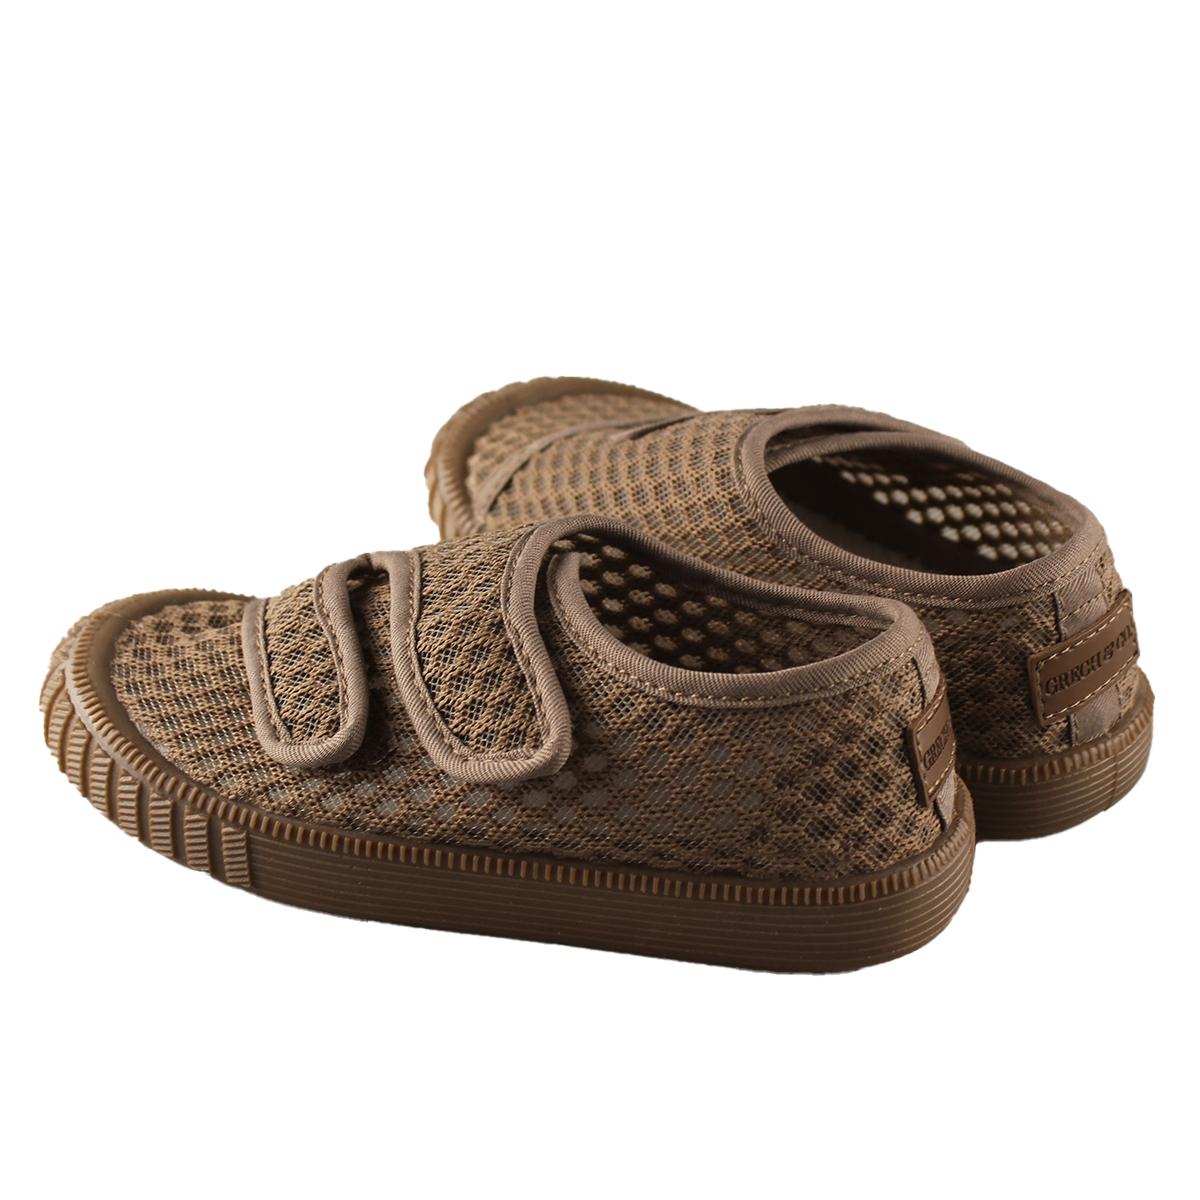 Chaussons & Chaussures Baskets Respirantes à Scratch Stone - 24 Baskets Respirantes à Scratch Stone - 24